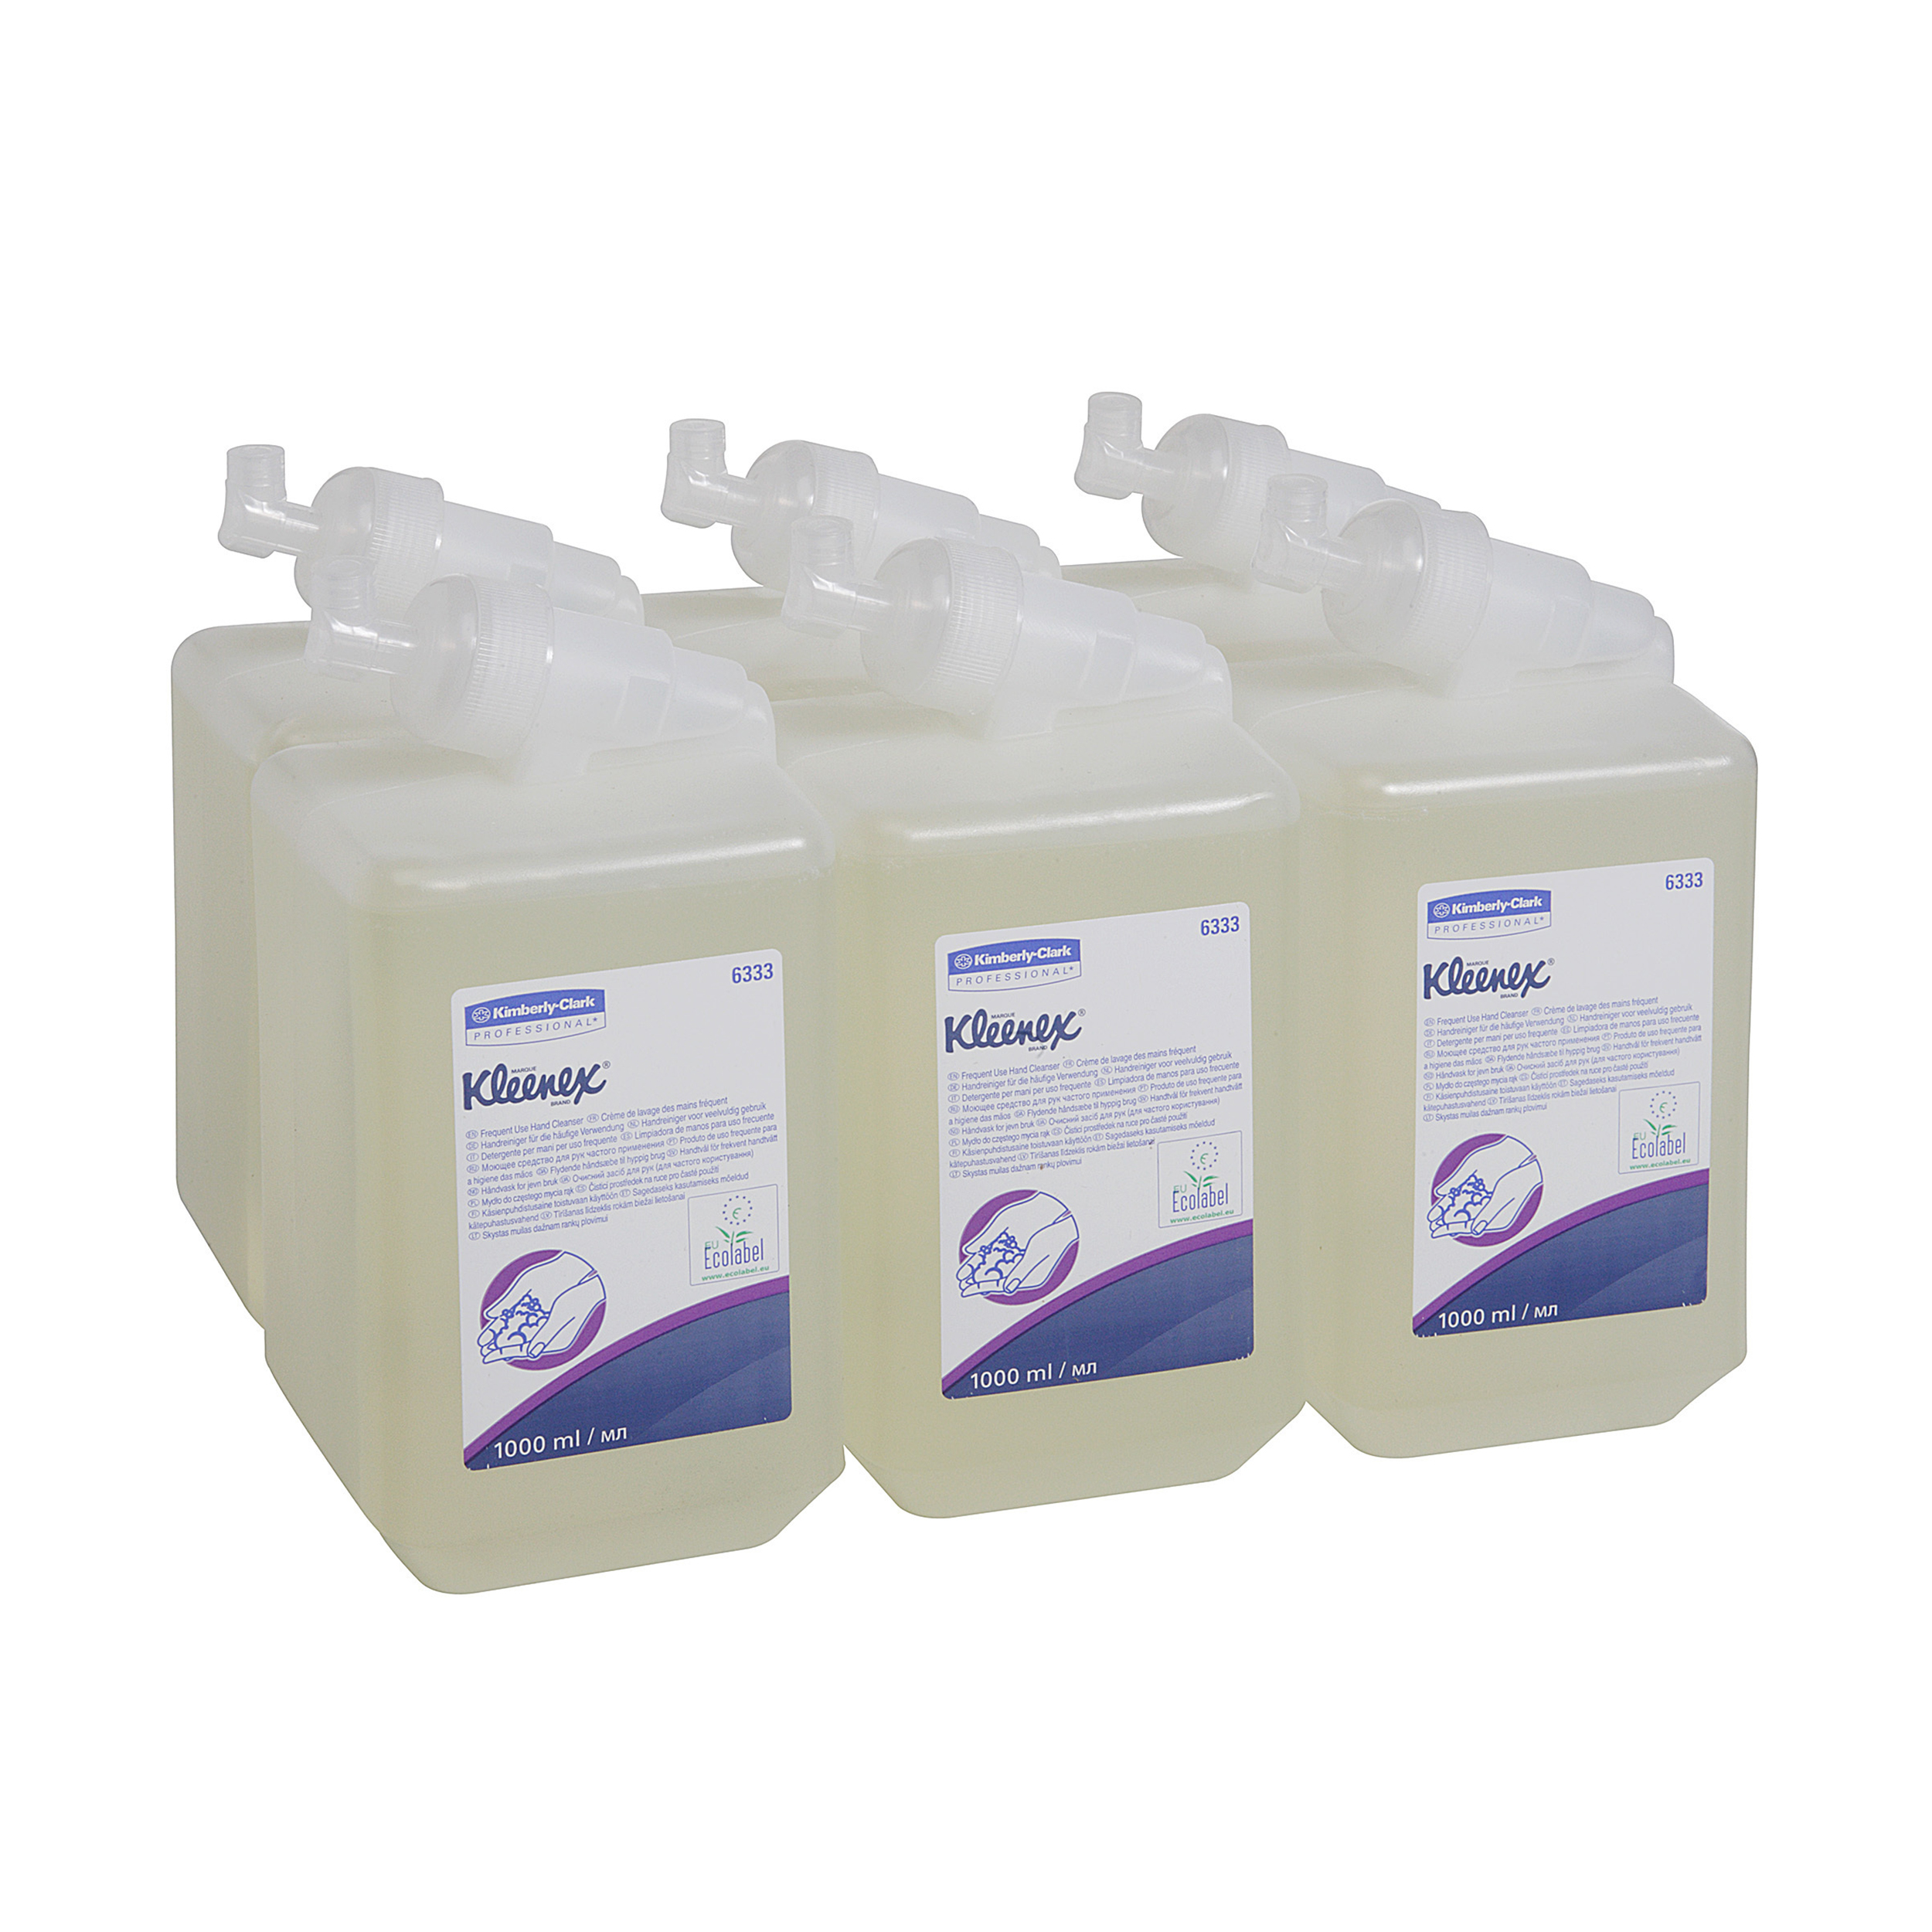 Kleenex Frequent Use Handwash Cassette 1 Litre Ref 6333 Pack 6